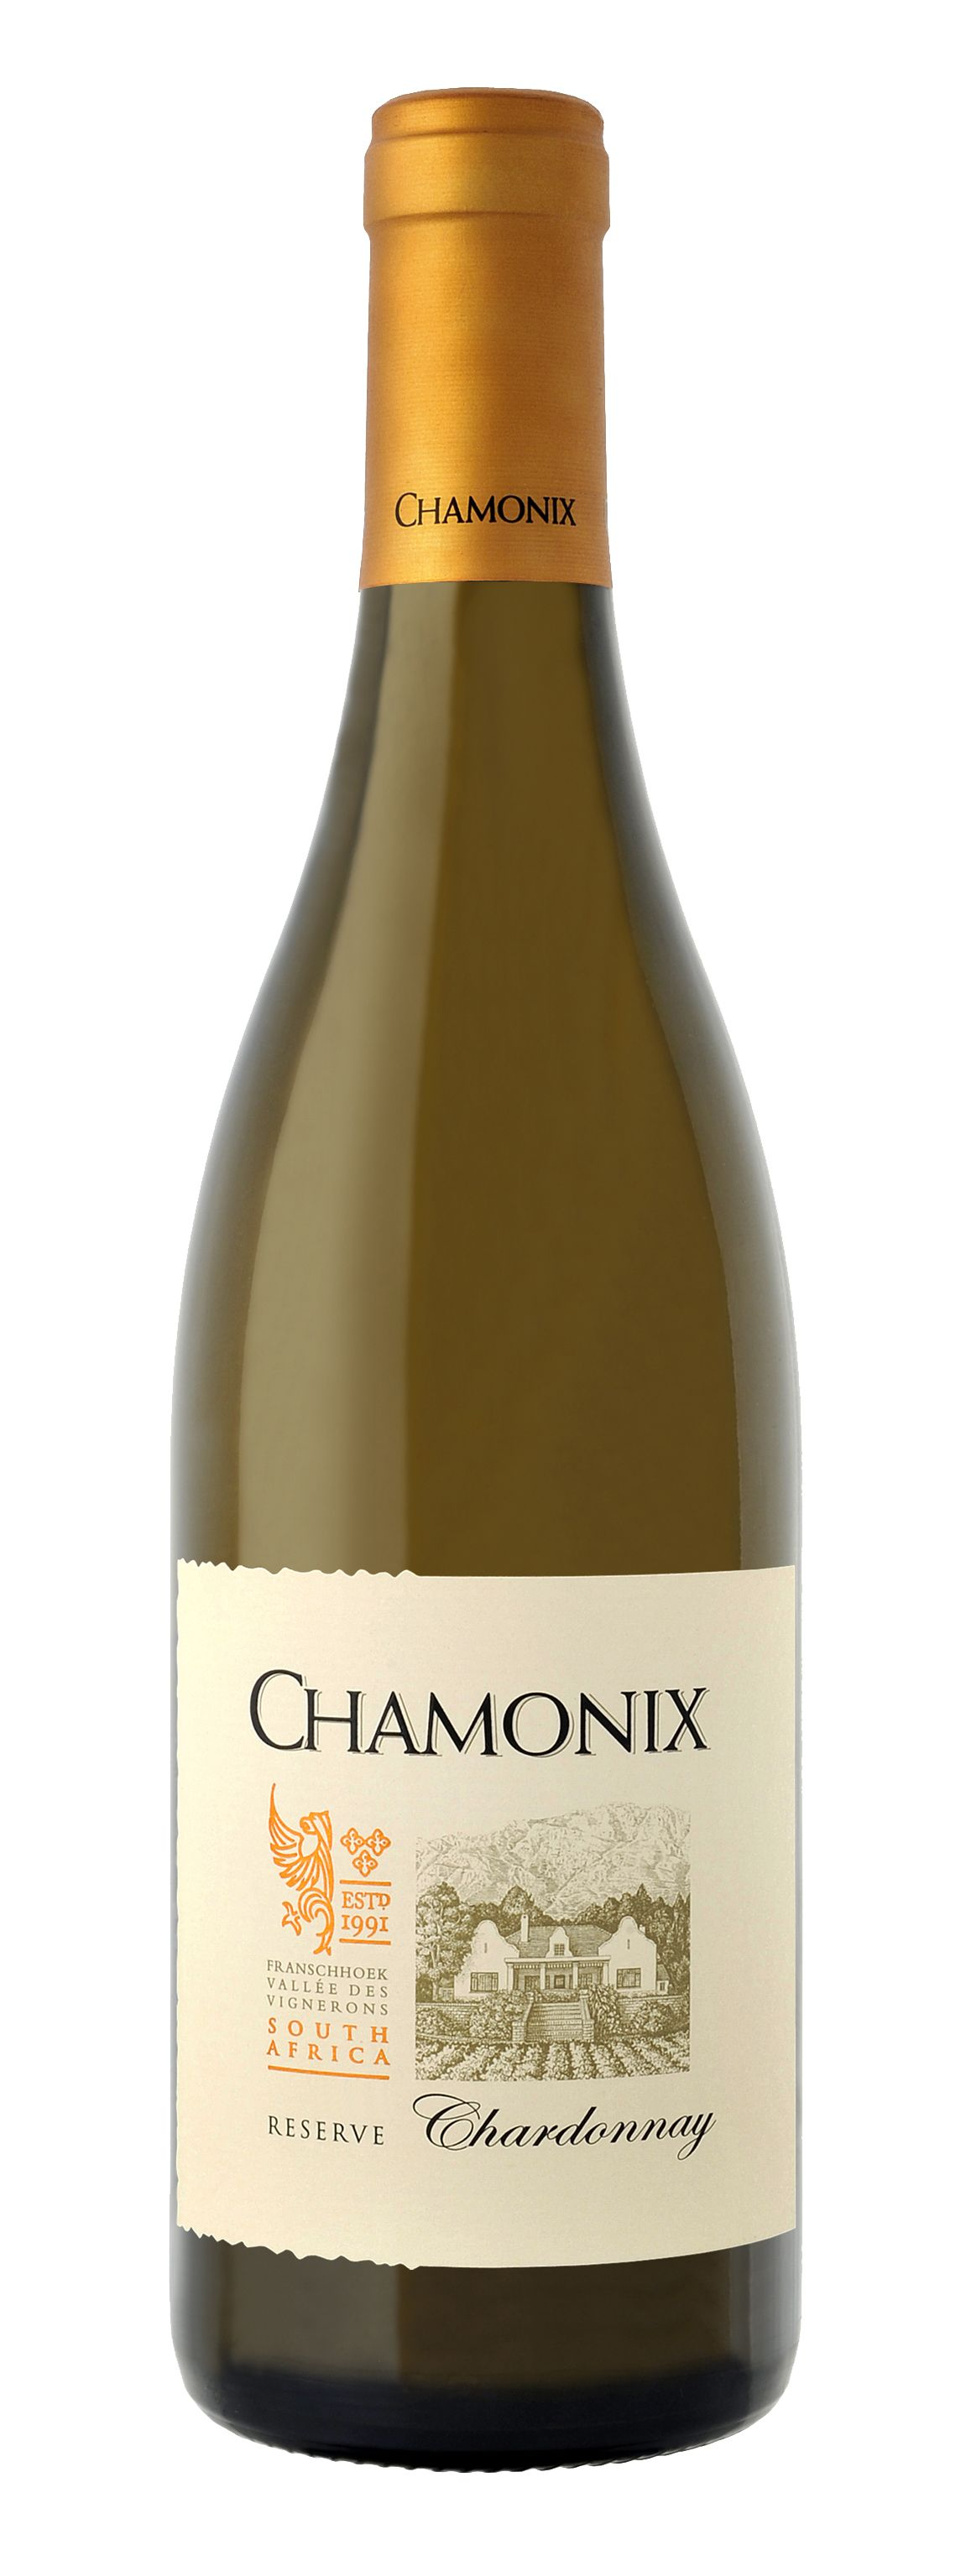 Chamonix chardonnay reserve south african wine italian